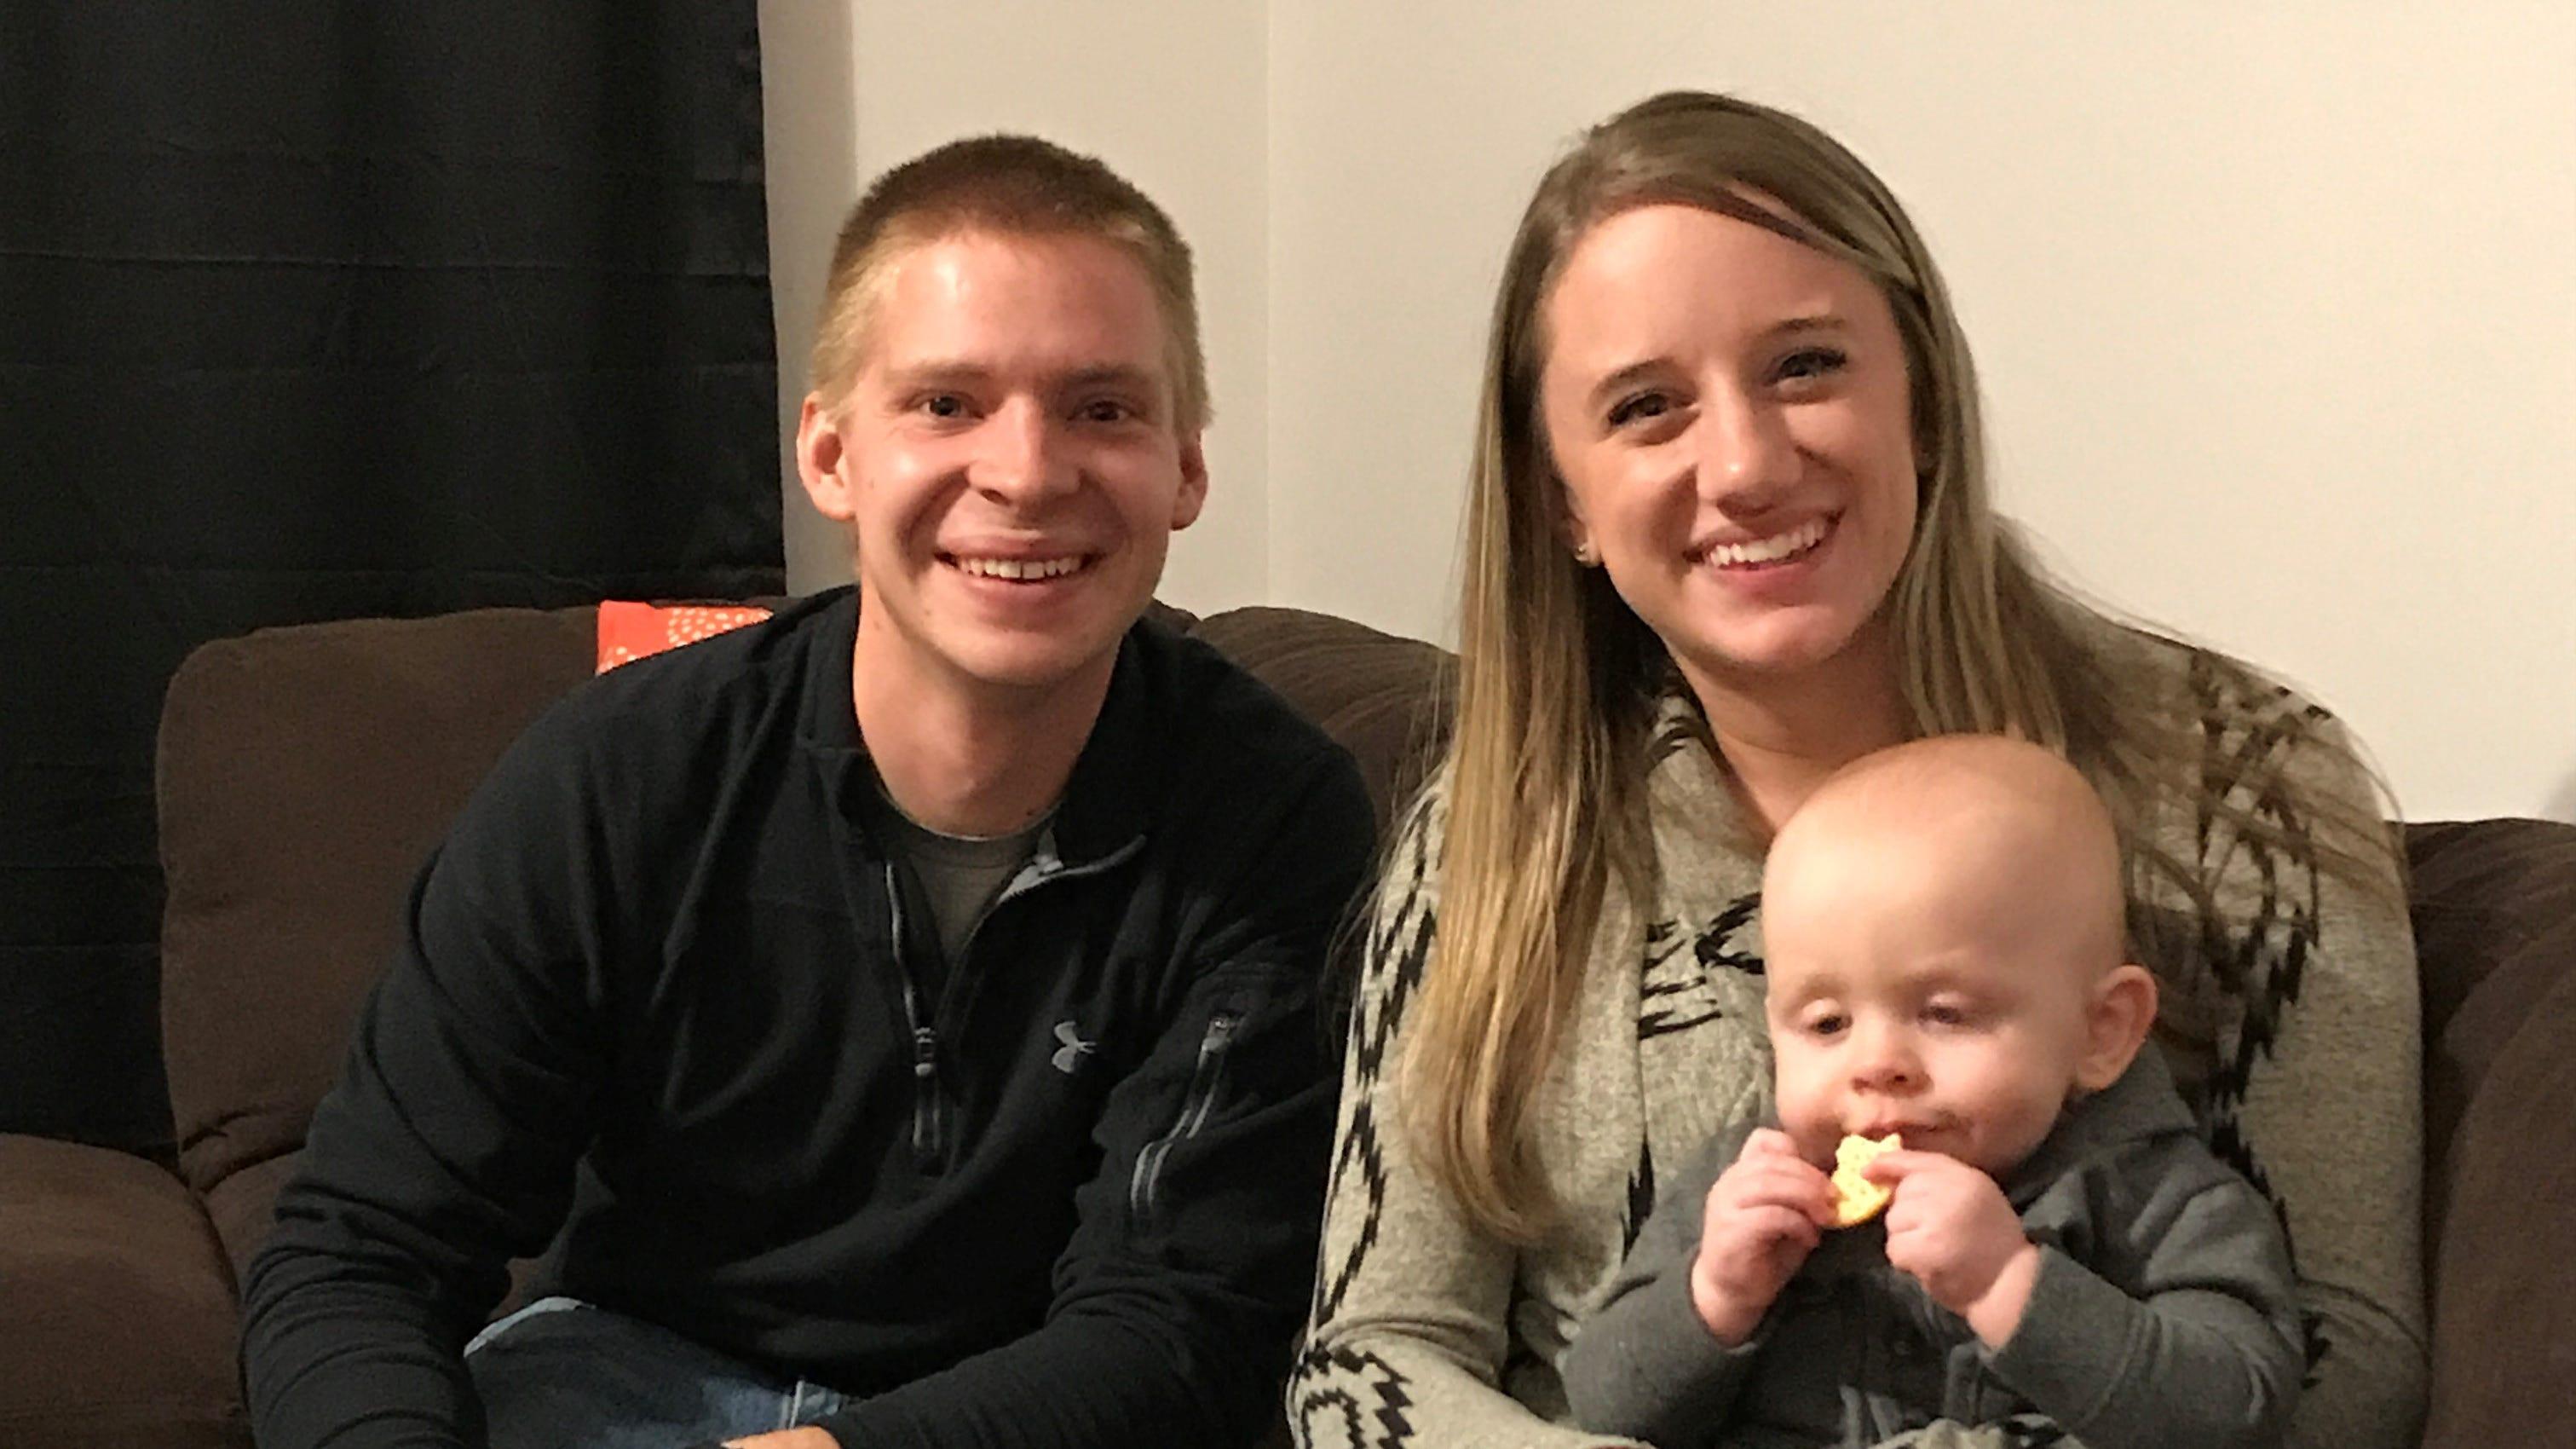 Greg (from left), Megan and Benjamin Neumer of Washington Twp. enjoy a quiet family moment. On Nov. 21, Ben turns 1.